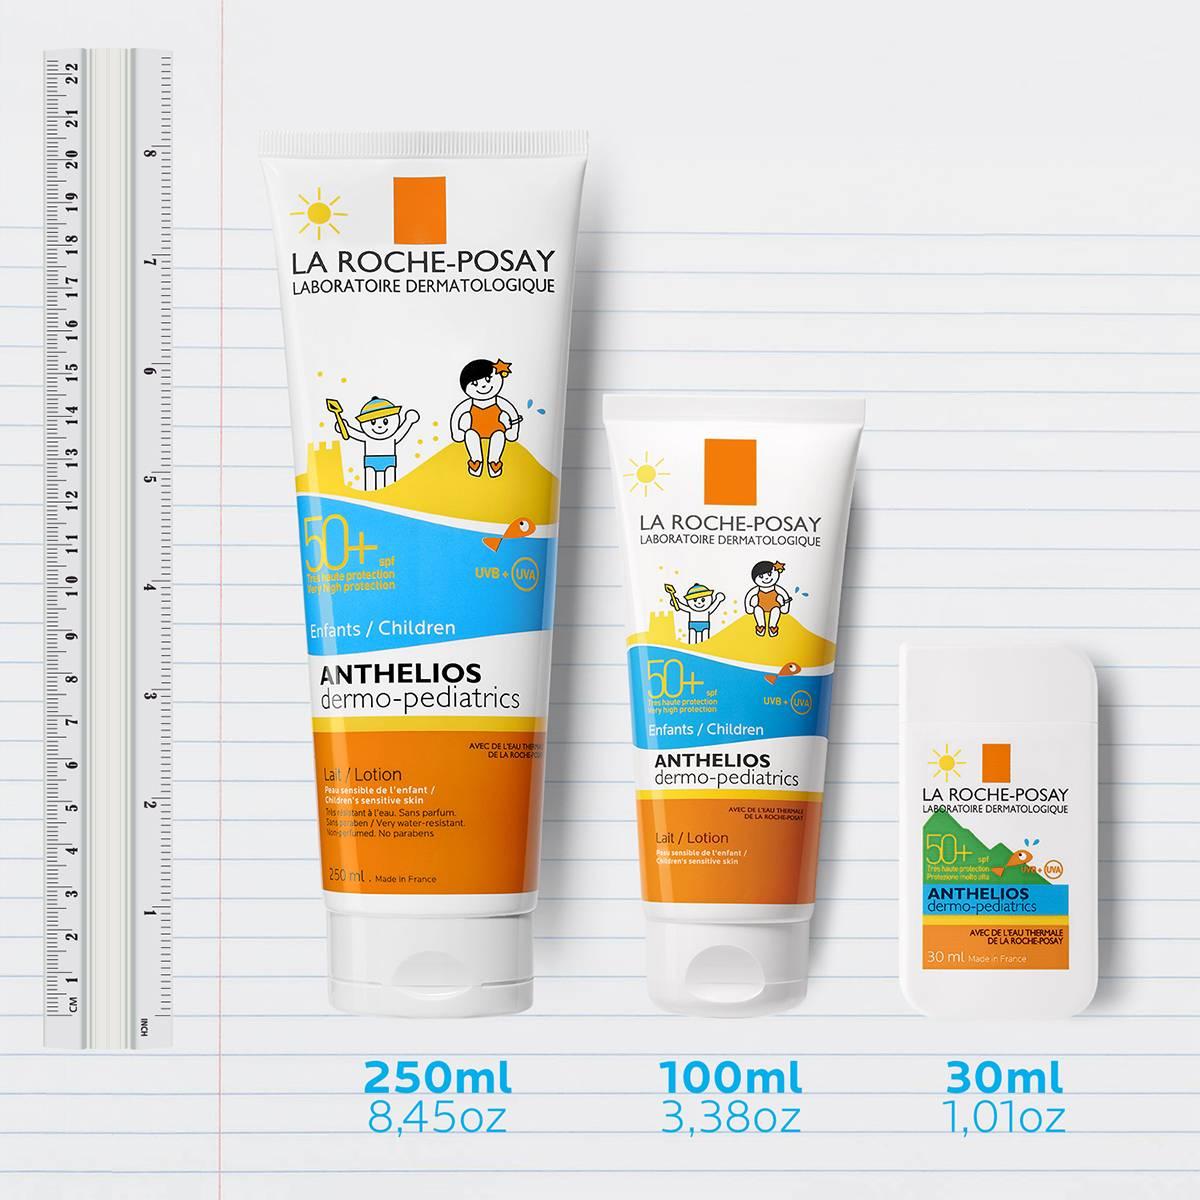 La Roche Posay Produktsida Sol Anthelios Dermo Pediatrics-serien 3337875